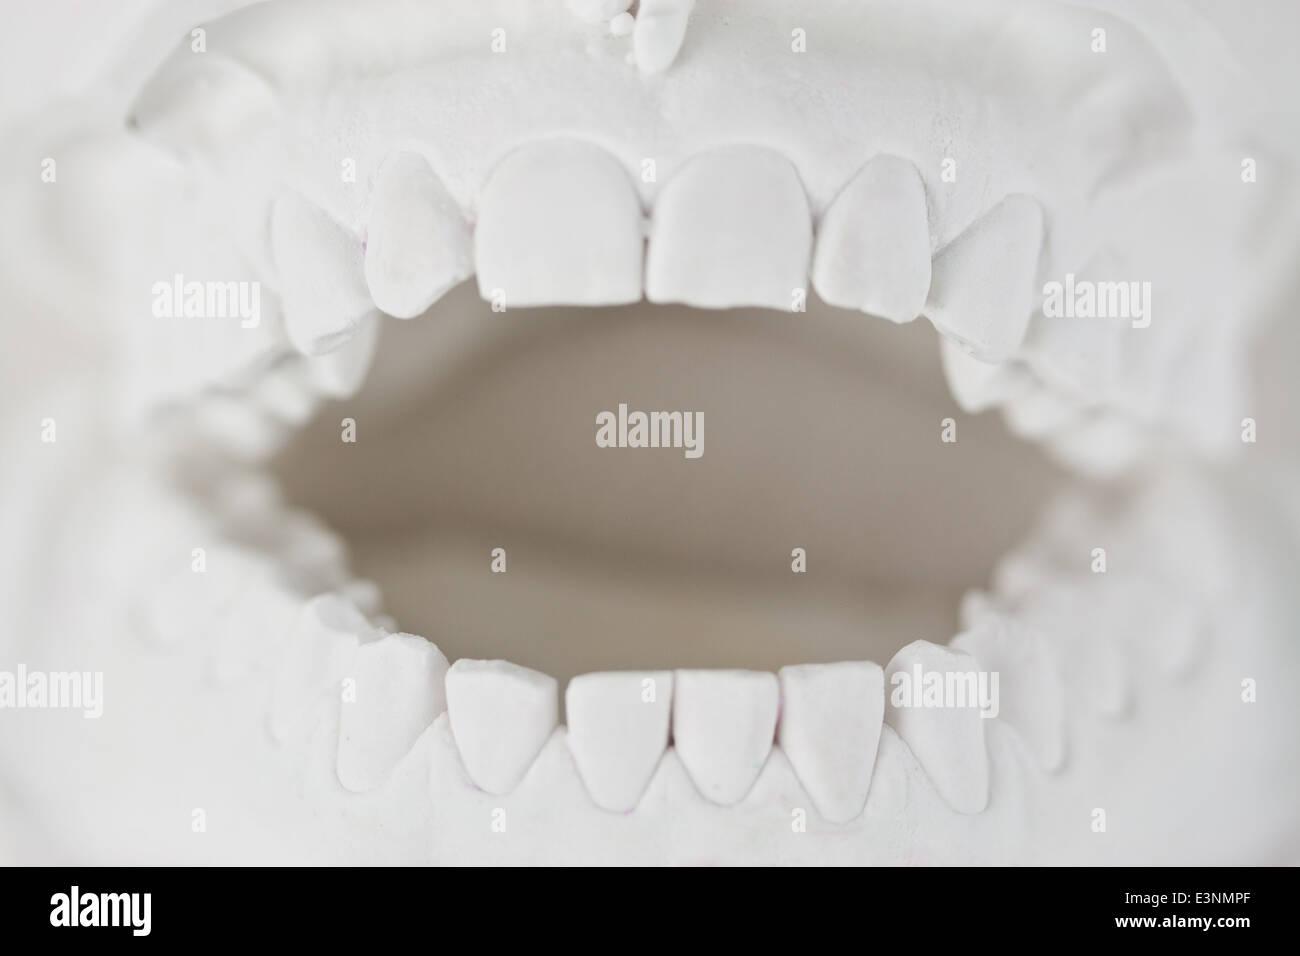 Zahnmodell - Stock Image